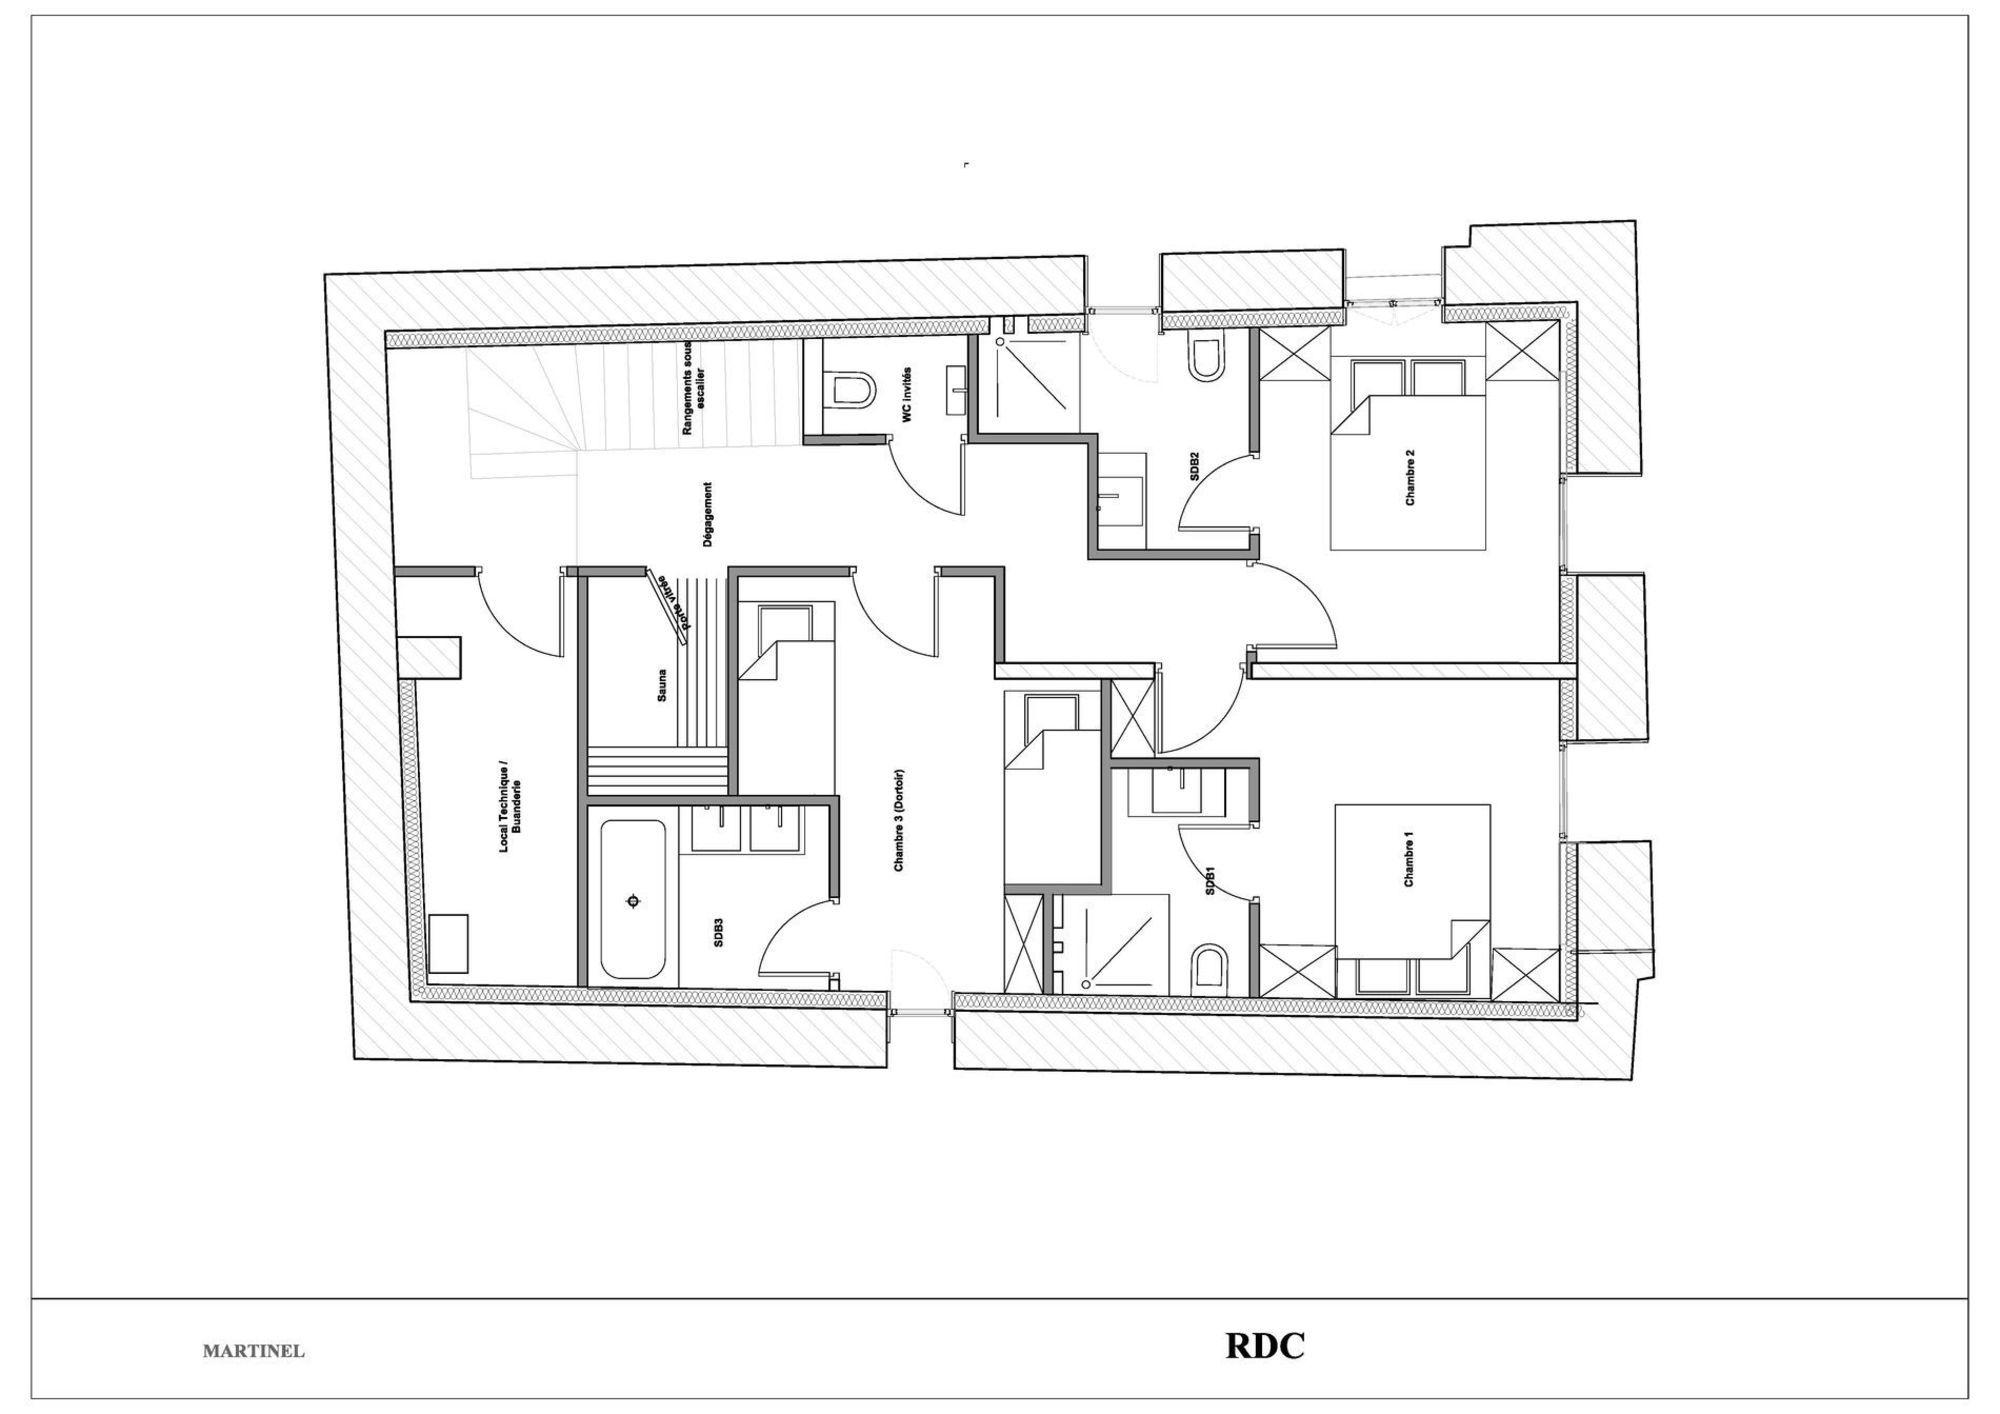 Chalet La Grange Martinel St-Martin-de-Belleville Floor Plan 1